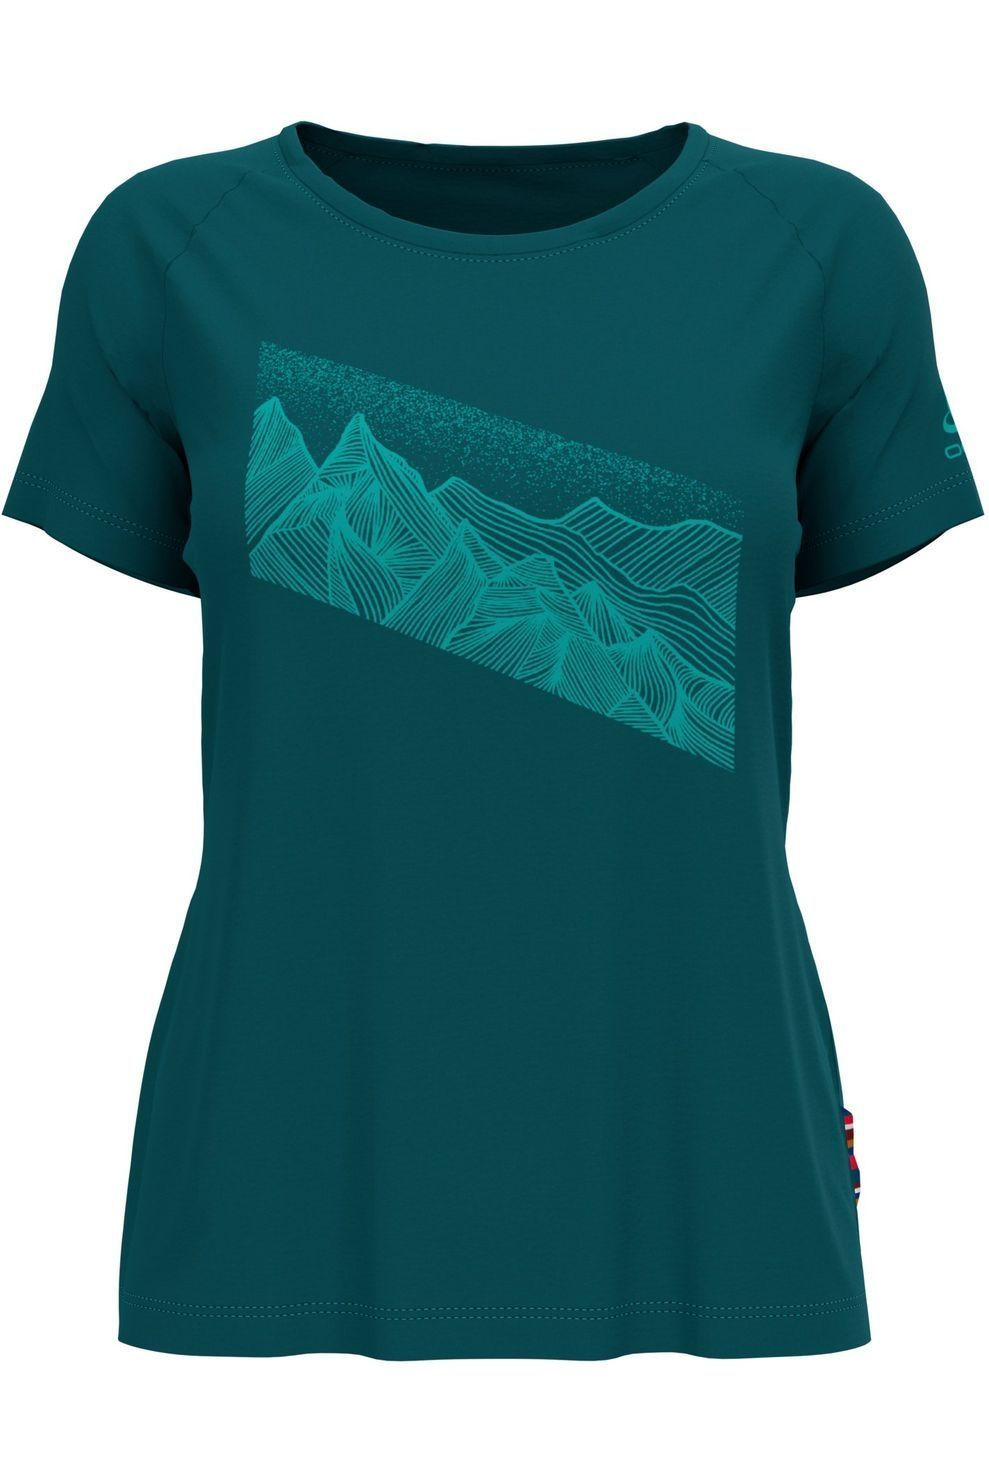 Odlo T-Shirt Concord voor dames - Groen - Maten: XS, S, M, L, XL